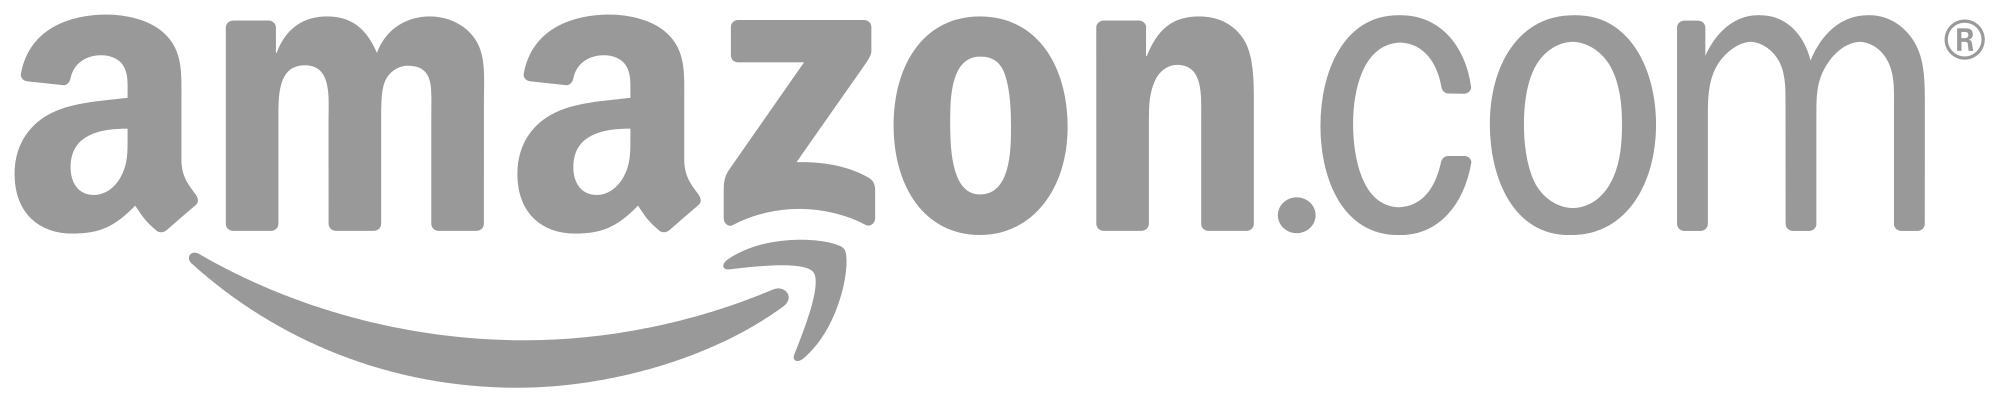 amazon-logo-gray